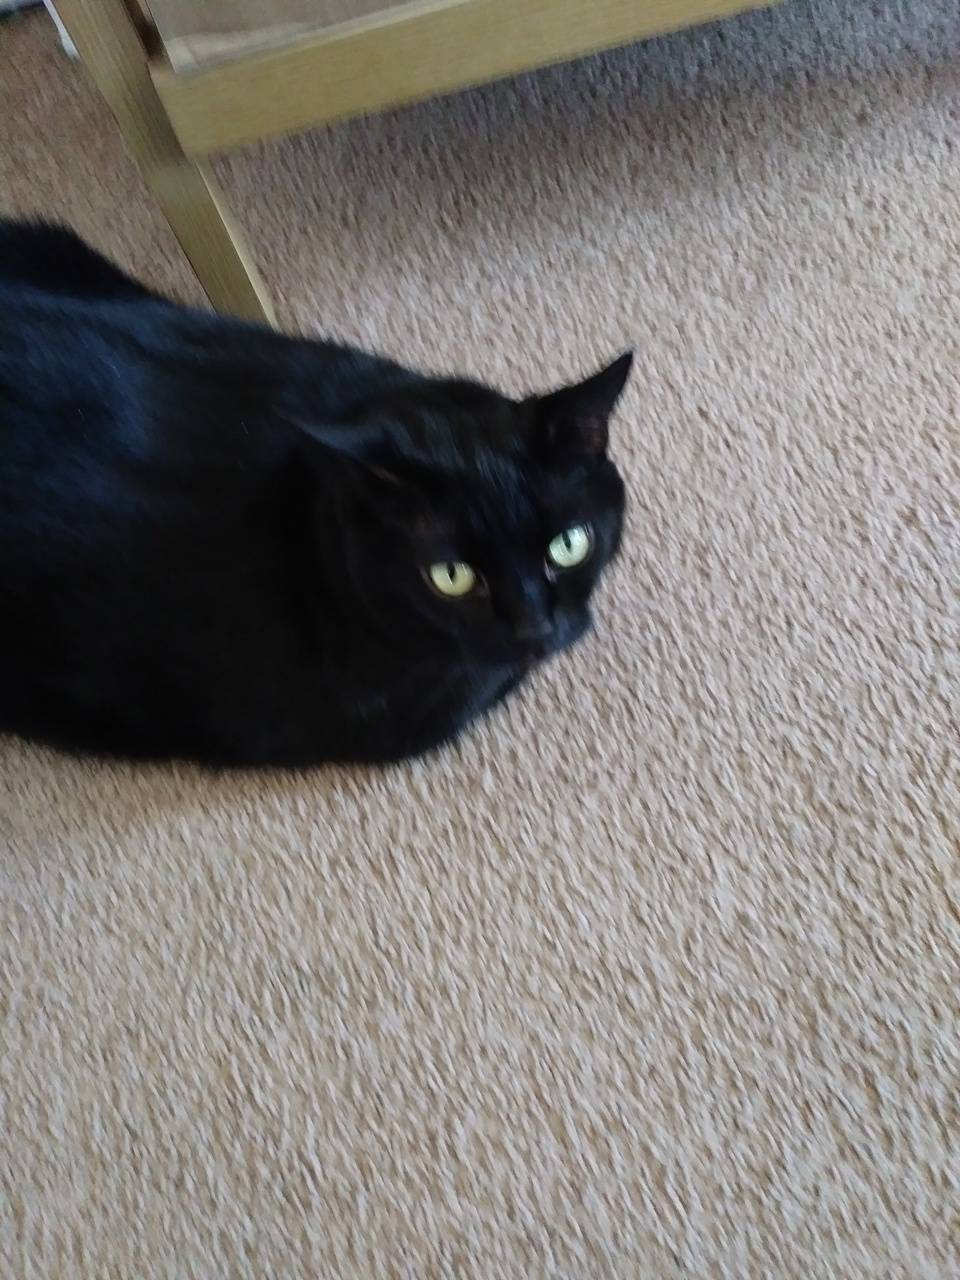 Sheba the black cat